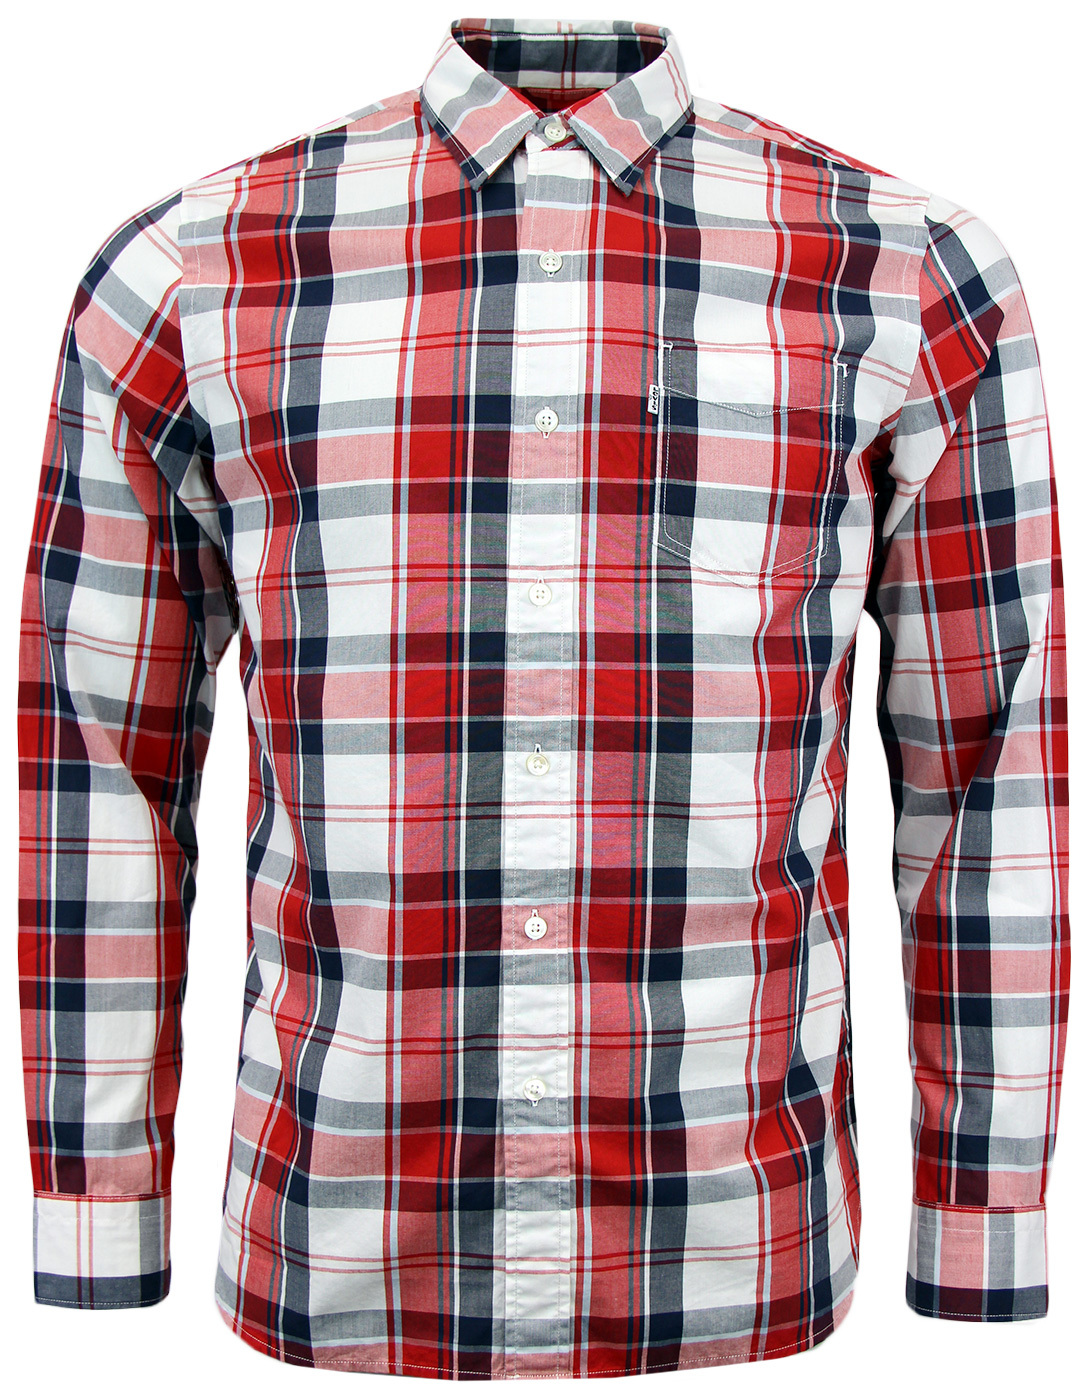 Sunset LEVI'S® Retro Mod 1960s Mens Check Shirt